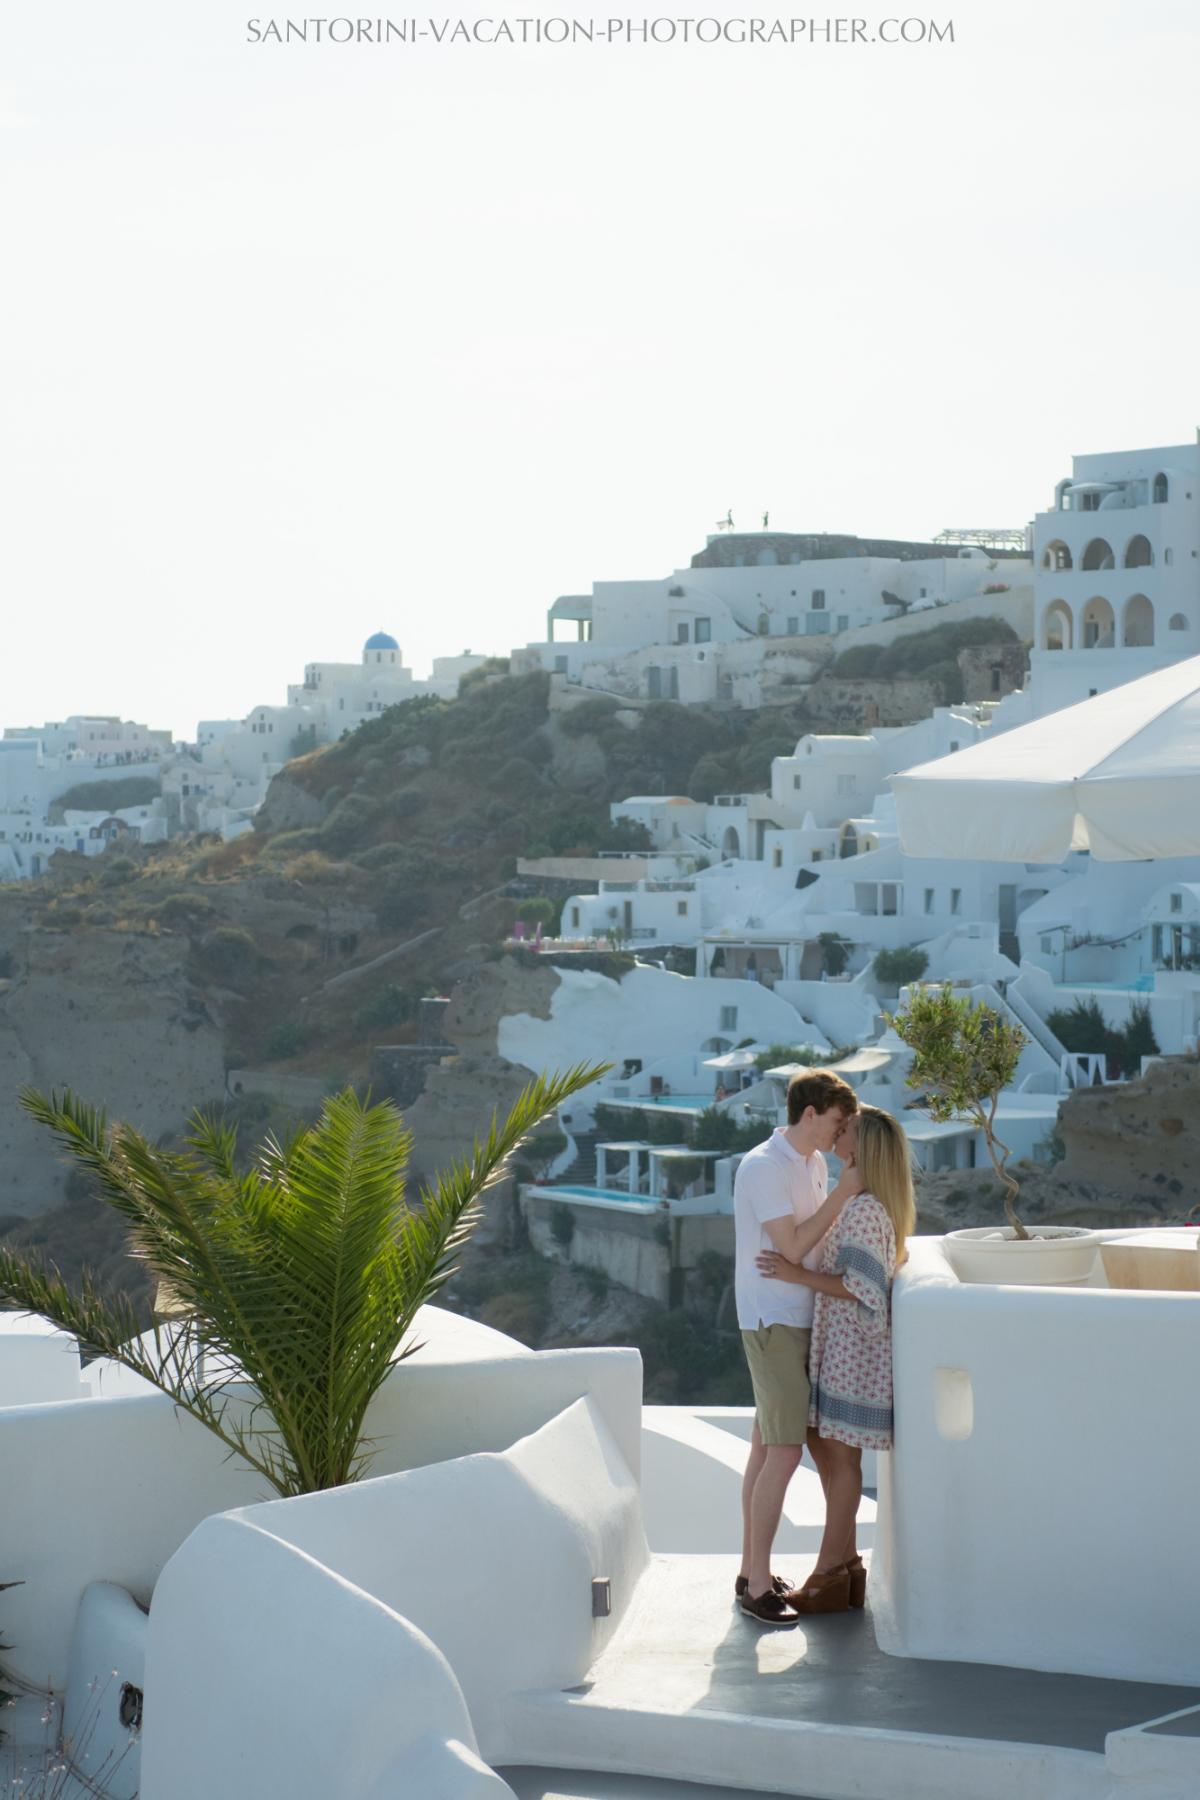 Honeymoon-in-Santorini-photo-shoot-lifestyle-portrait-001